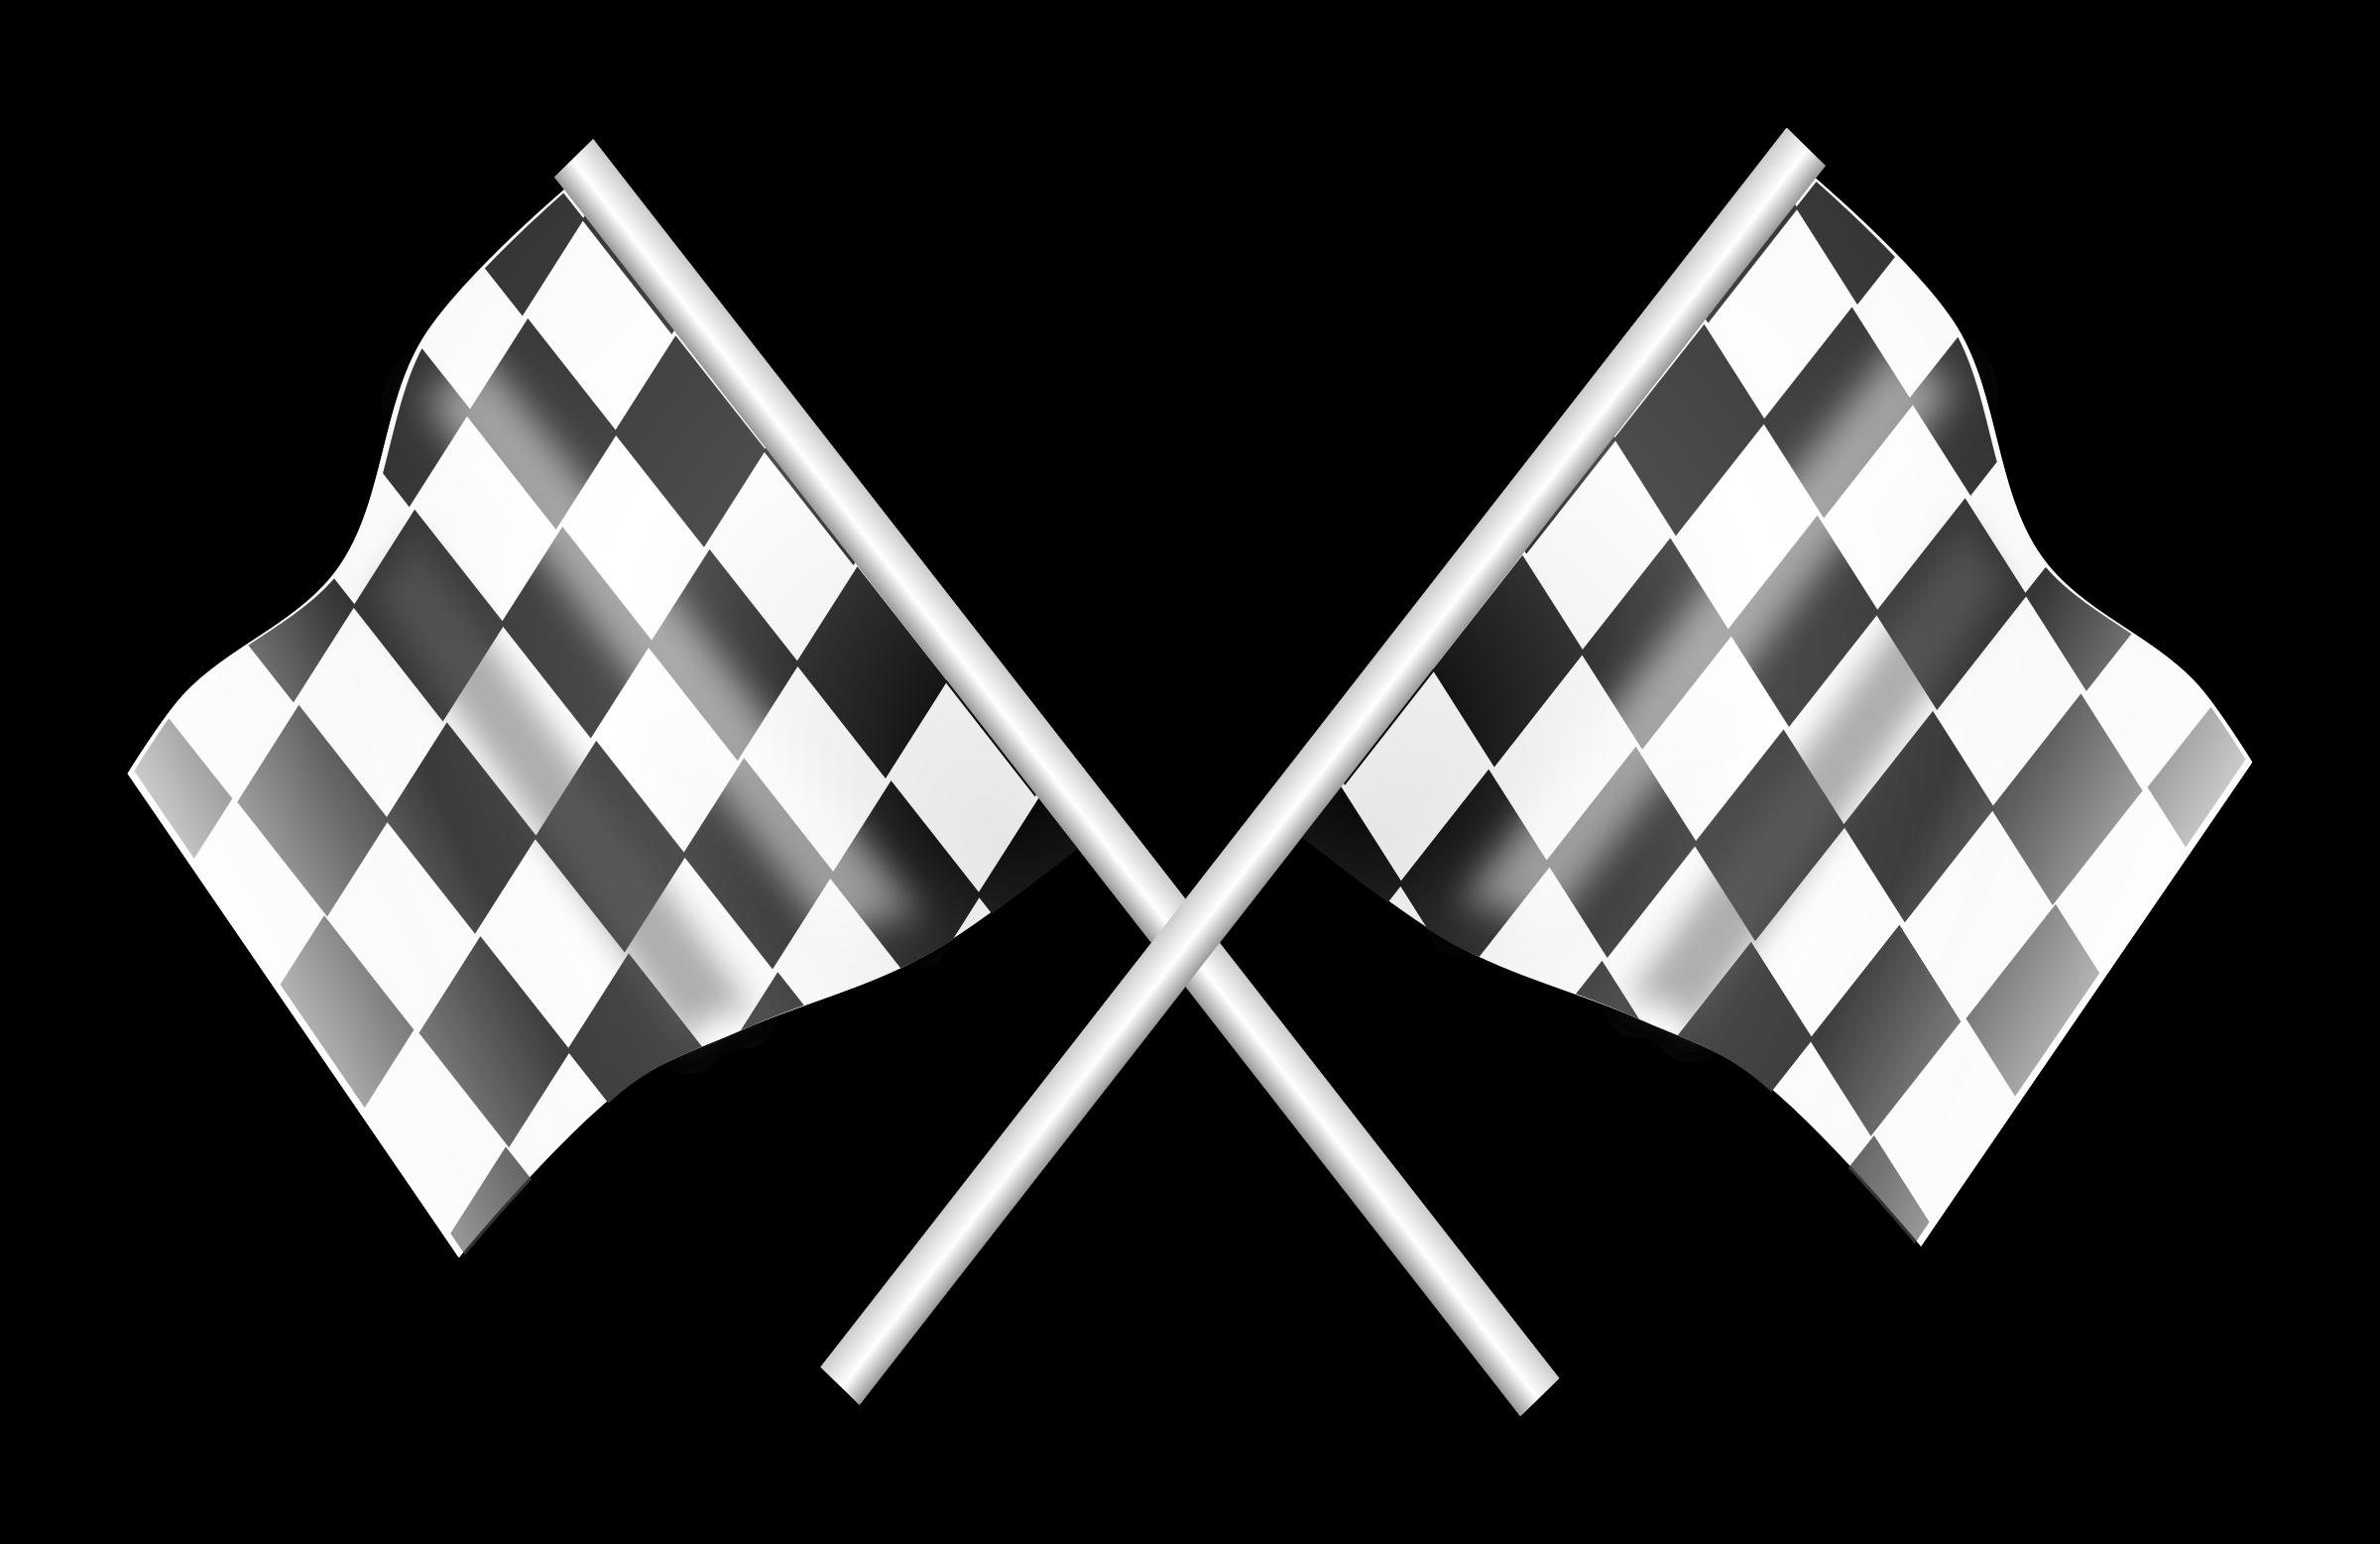 Race car flags clipart transparent Clipart - Racing Flag transparent